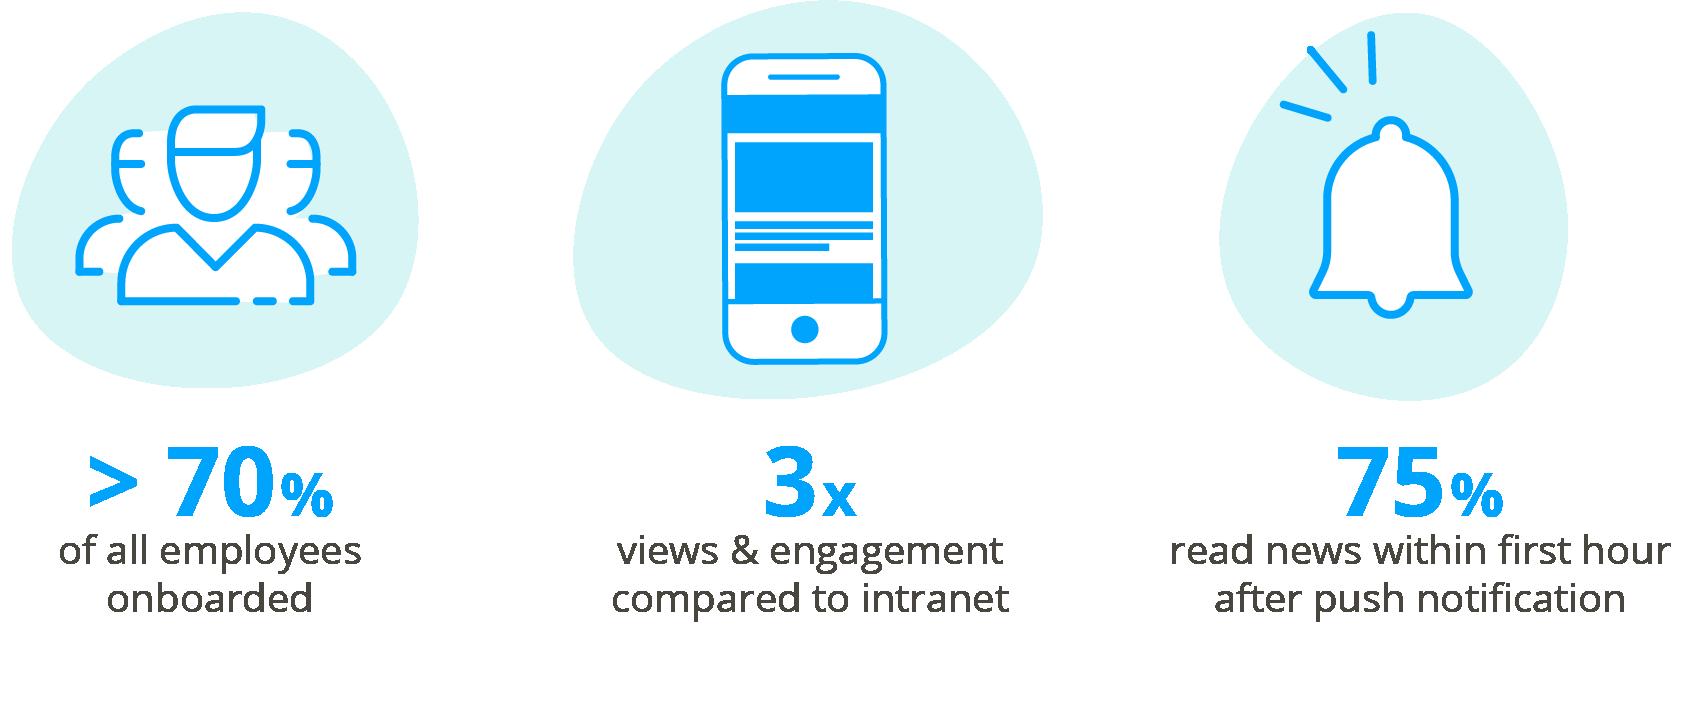 advantages app over intranet